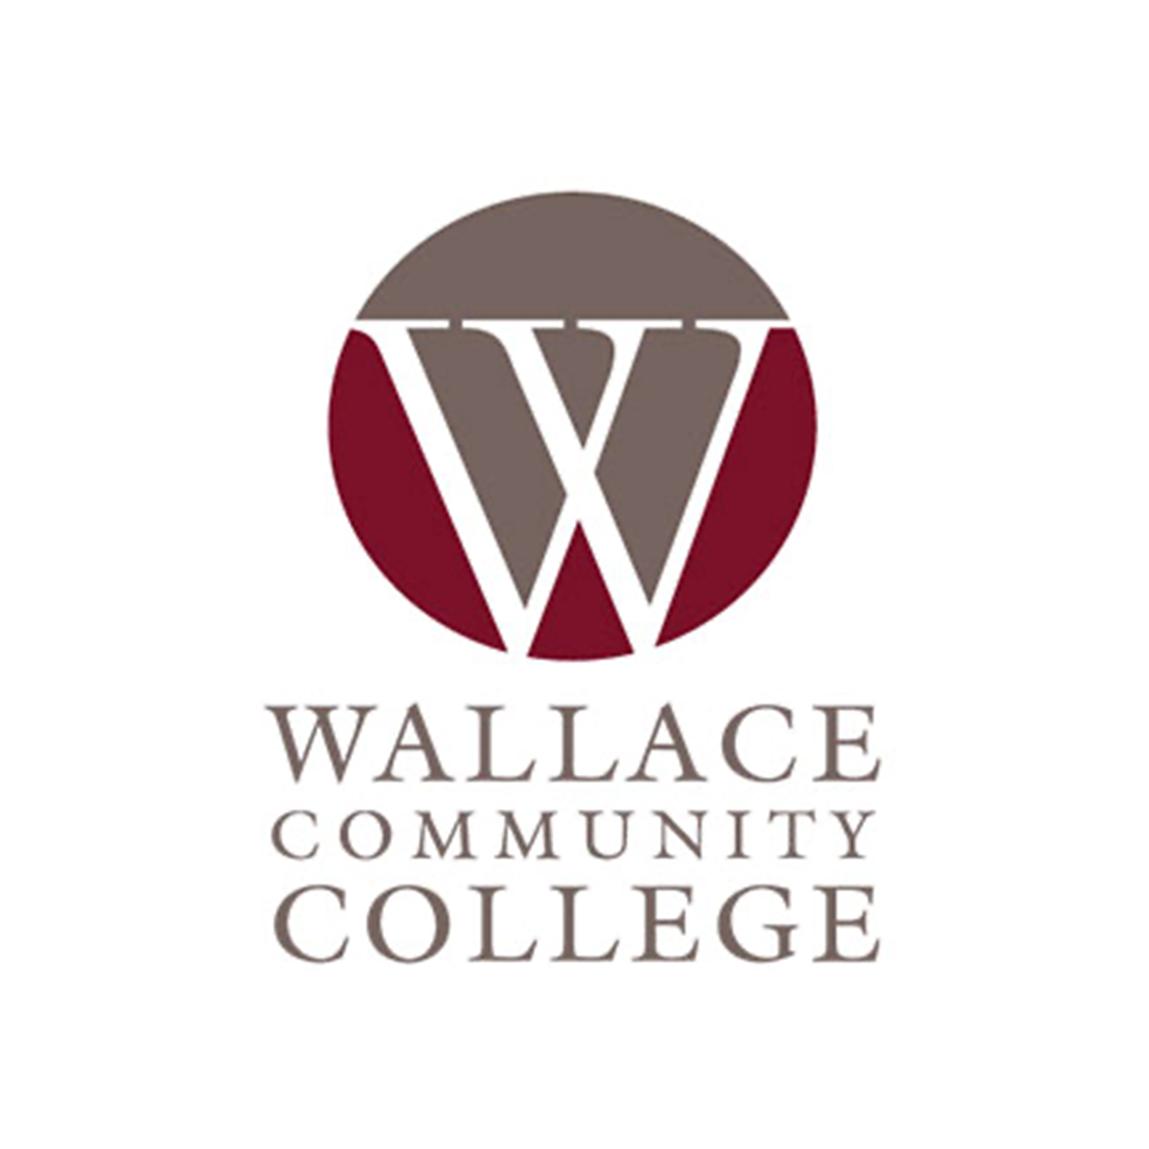 http://walterscontrols.net/wp-content/uploads/2019/12/walalce.png